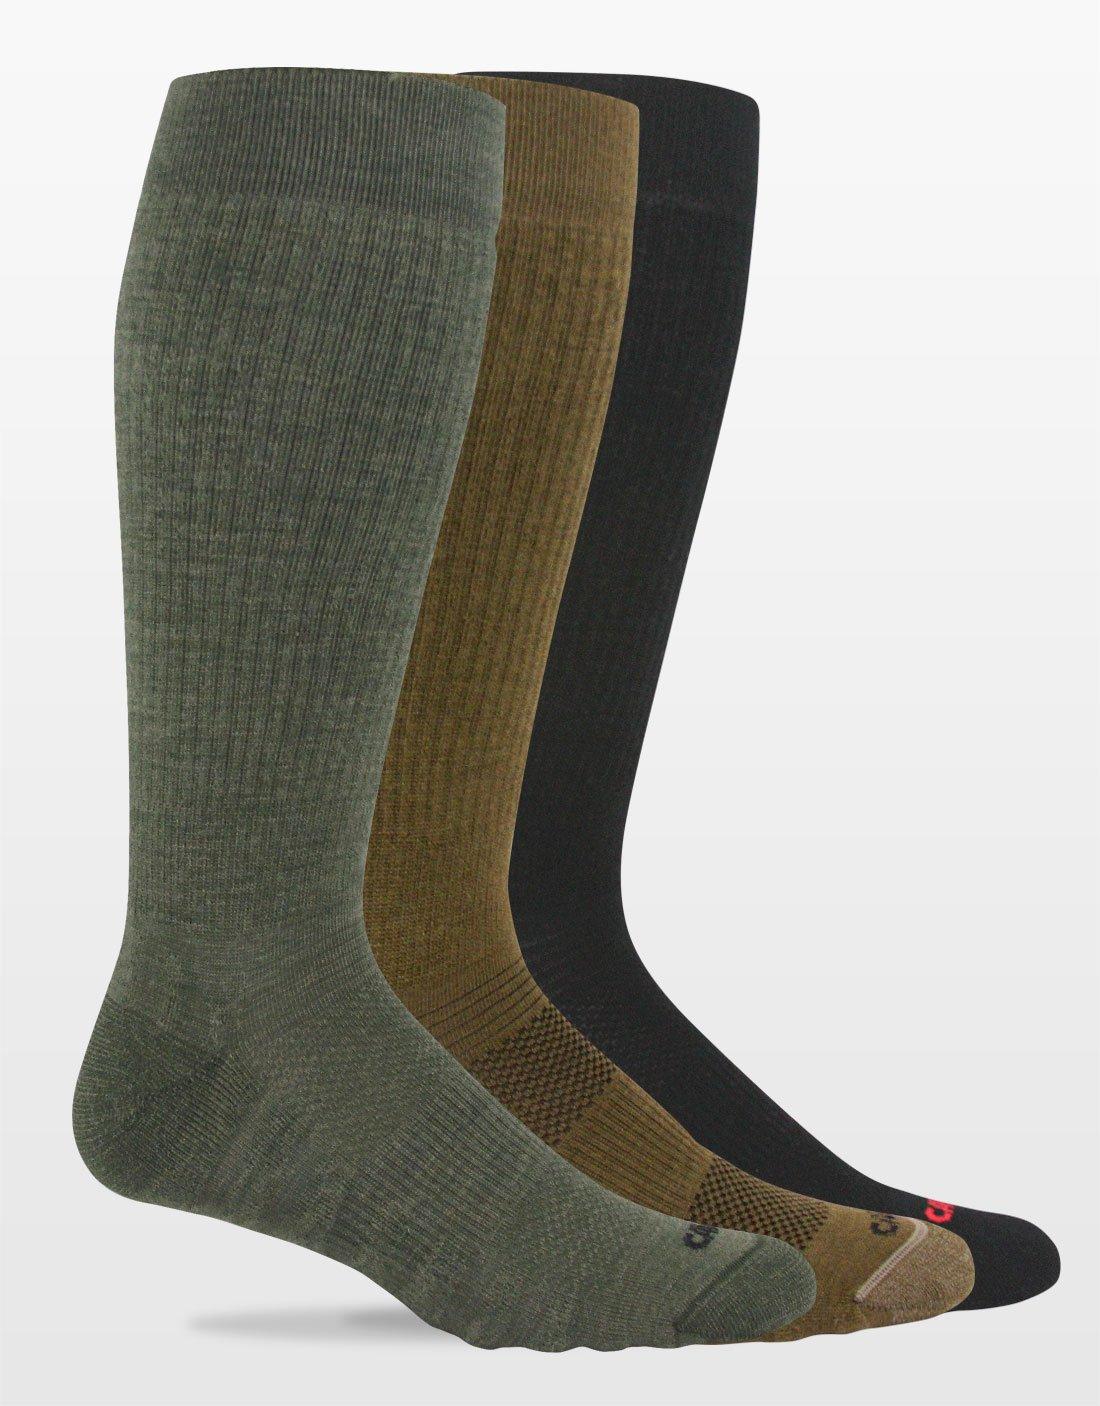 Cavu boot socks